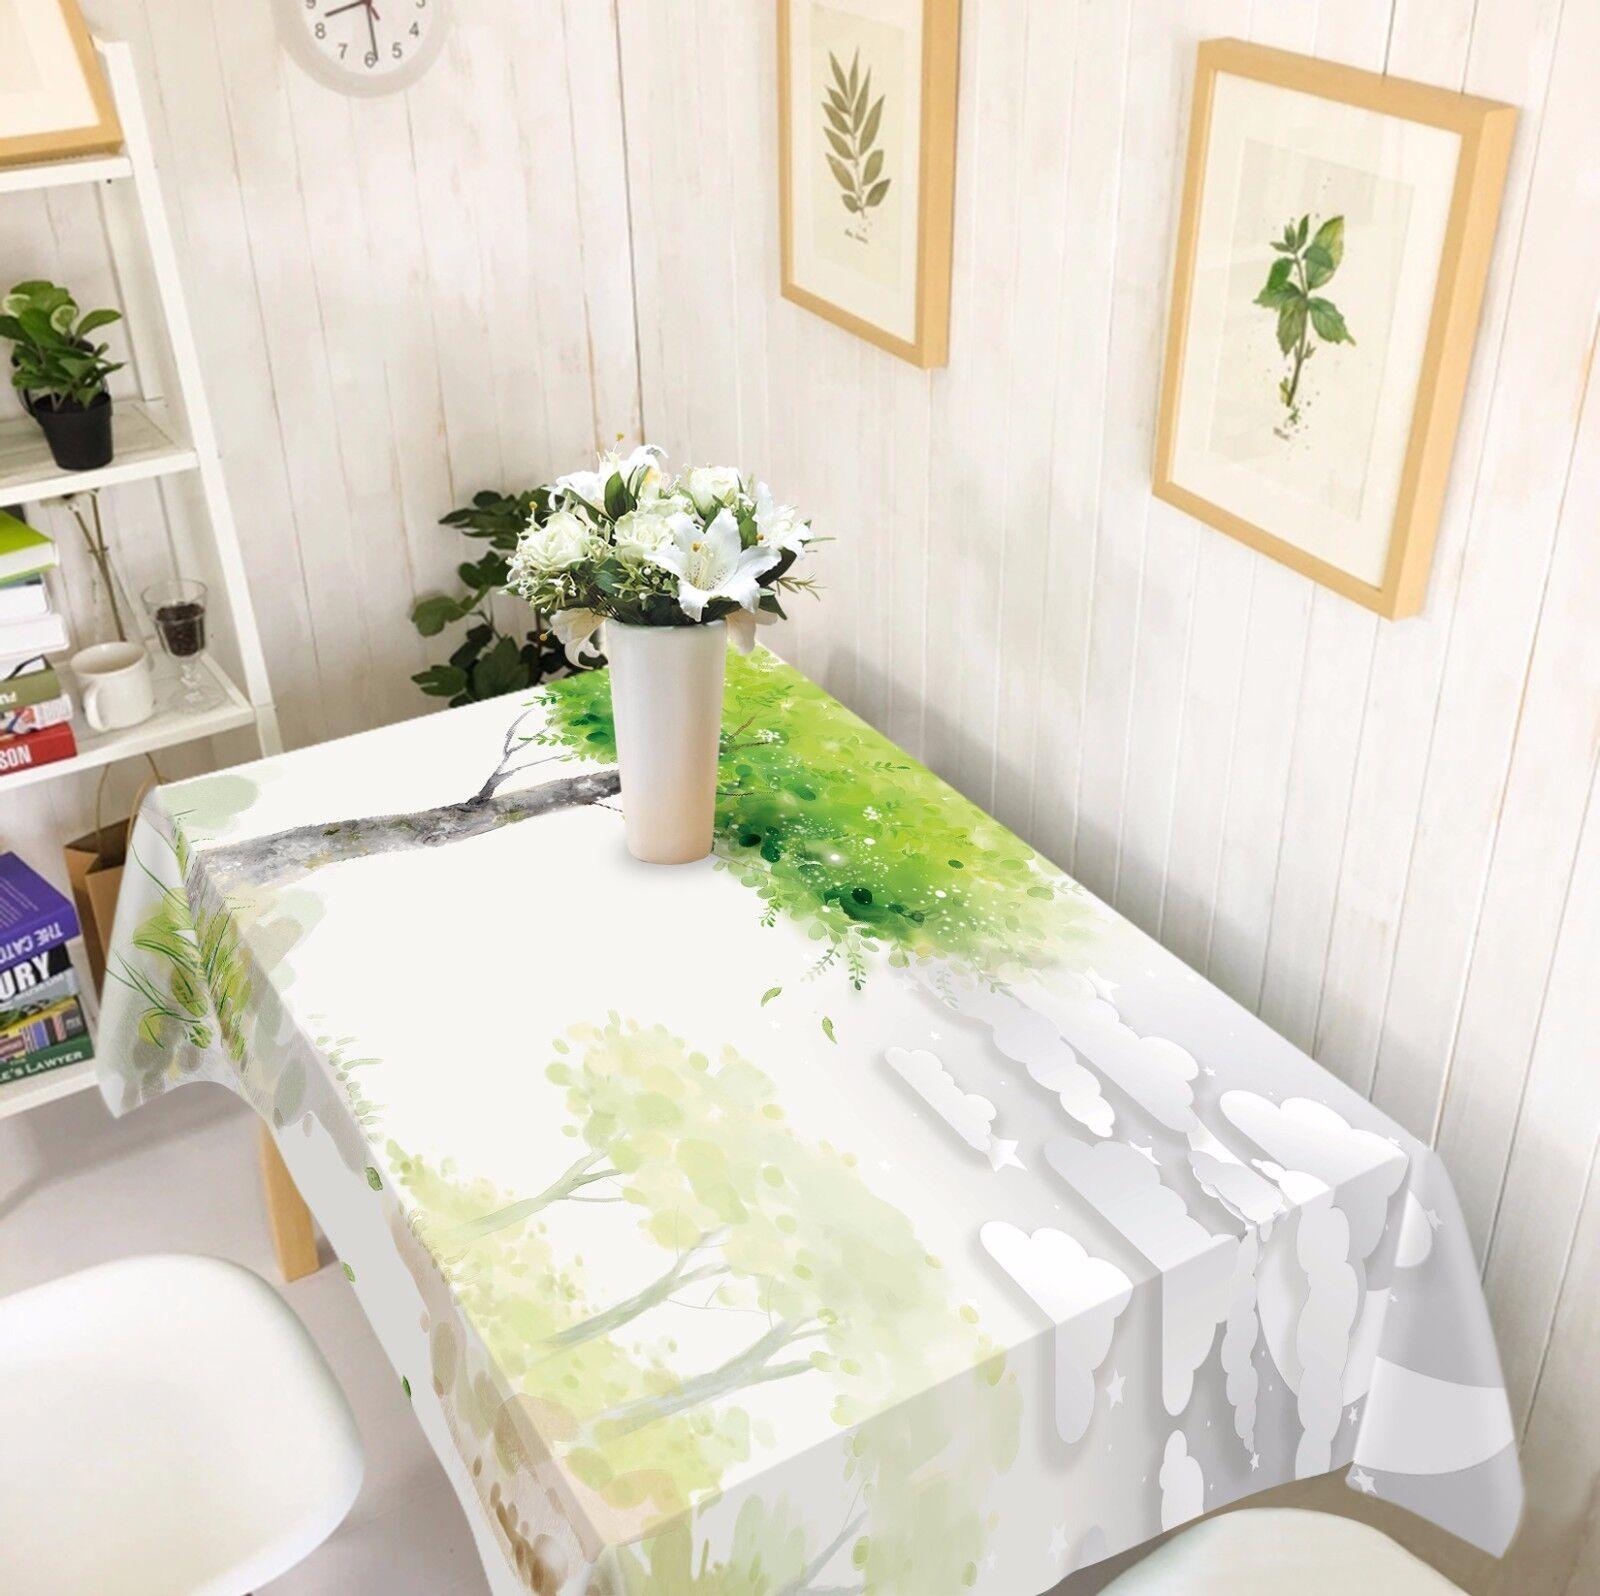 3D Tree 67 Tablecloth Table Cover Cloth Birthday Party AJ WALLPAPER UK Lemon